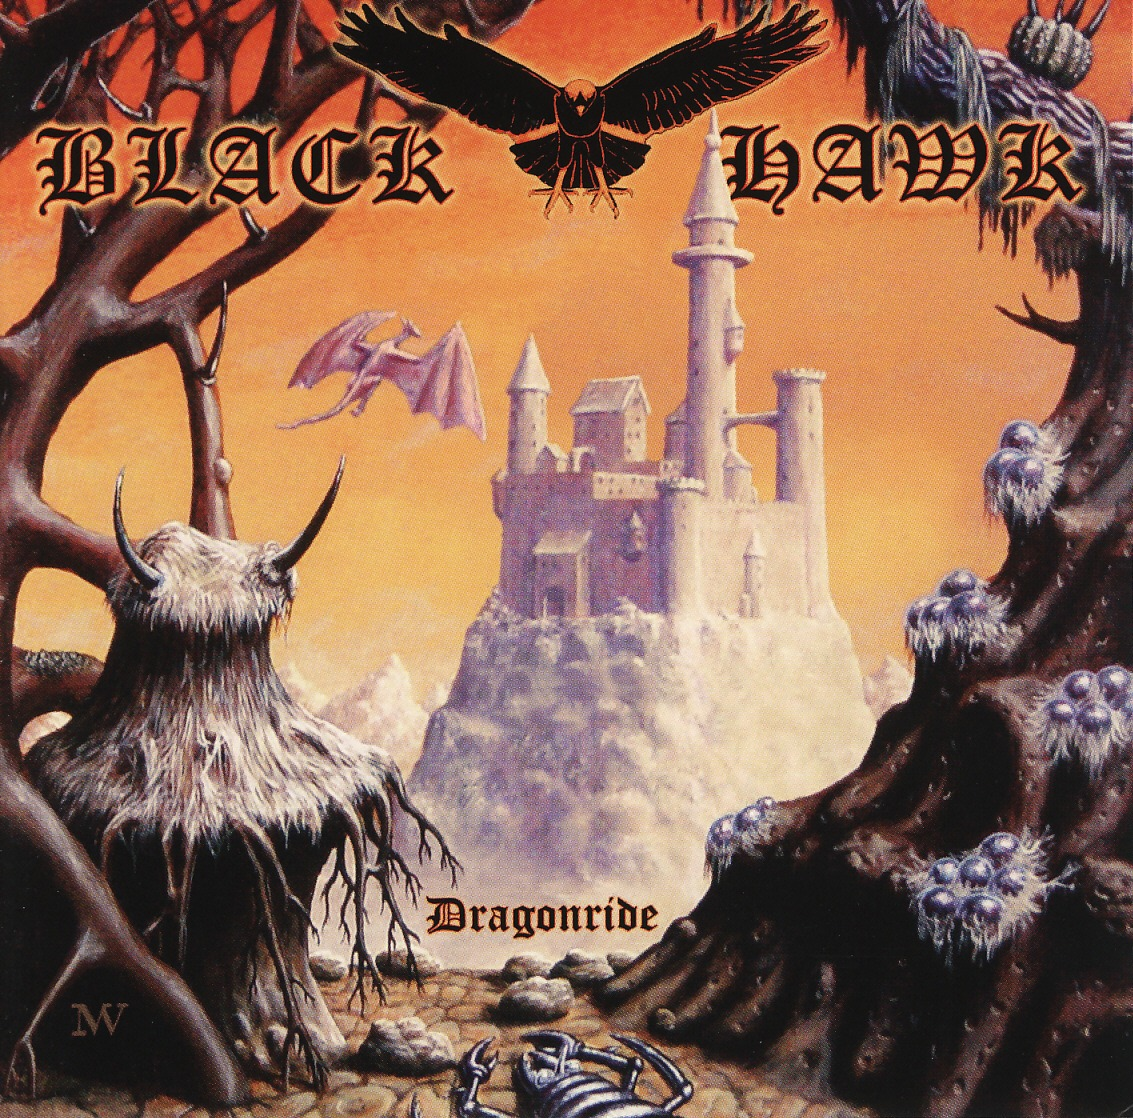 BLACK HAWK (Germany) / Dragonride + 6